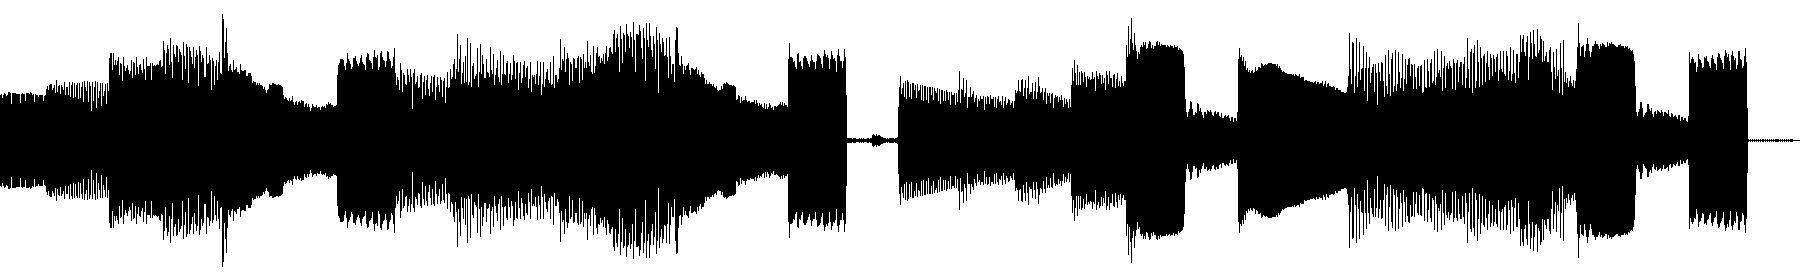 guitar sample 100bpm